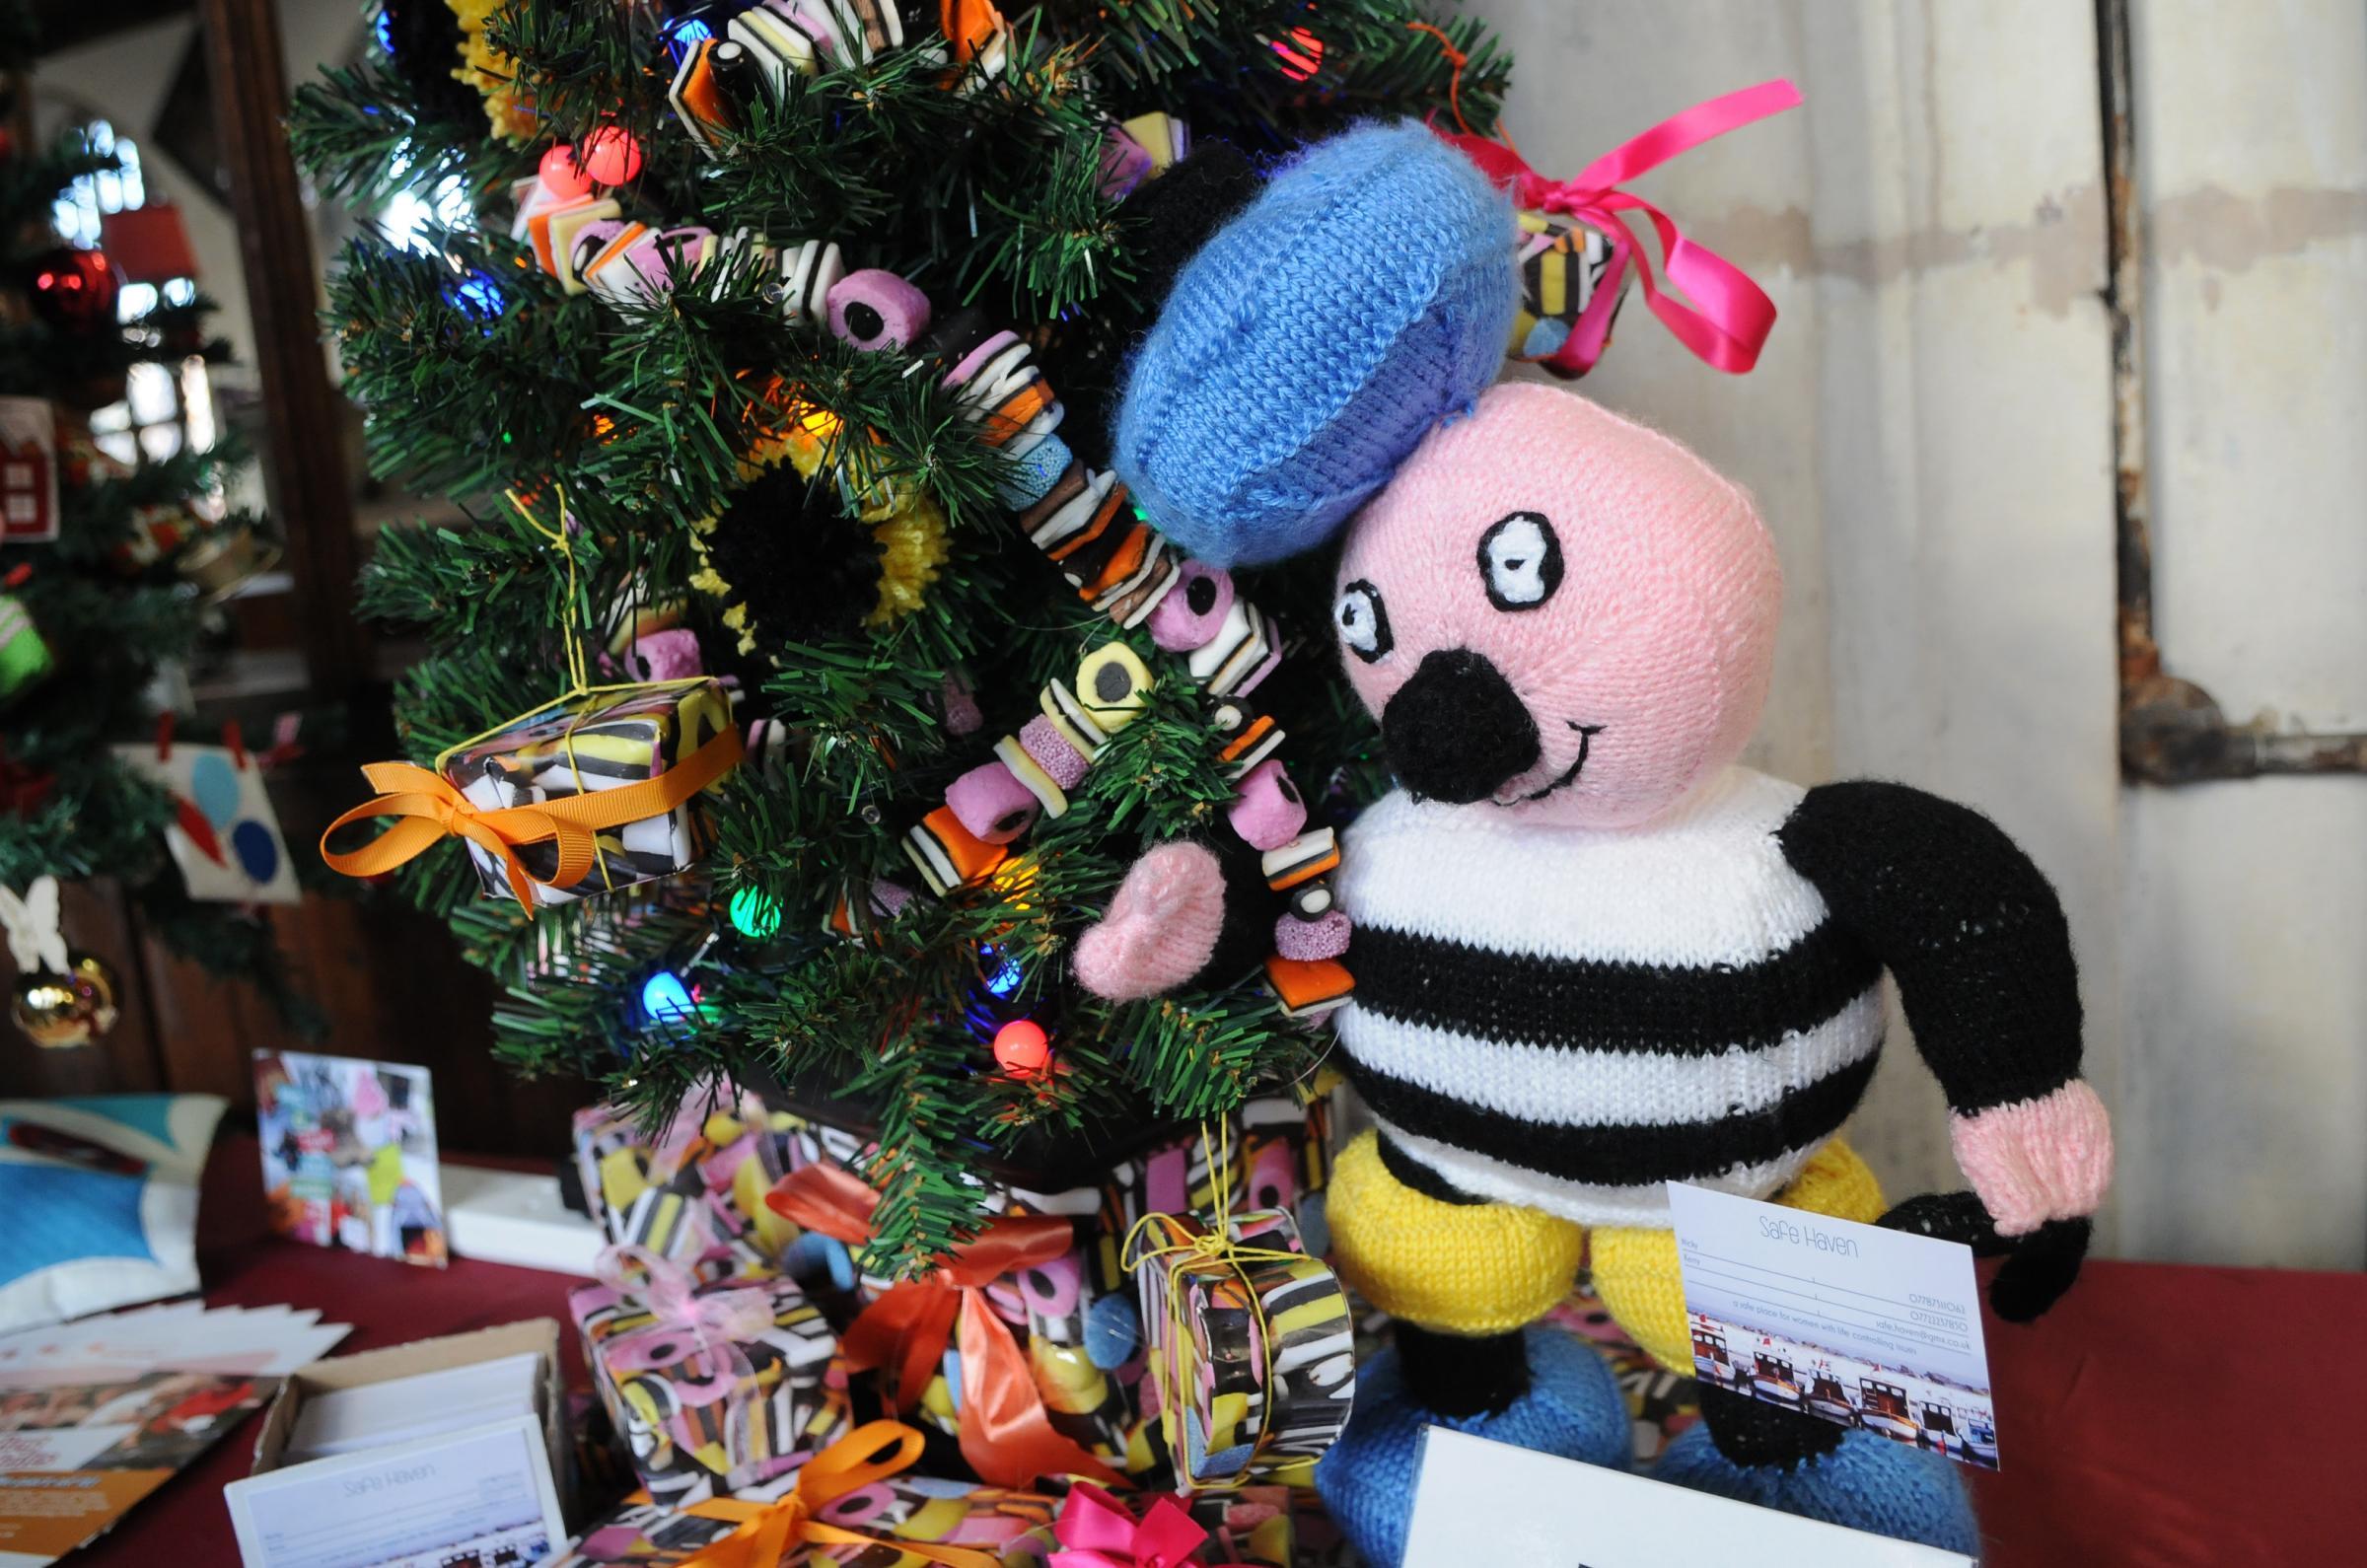 U0027Allsorts   All Welcomeu0027 By Safe Haven At Last Yearu0027s St Thomasu0027s Christmas  Tree. U0027